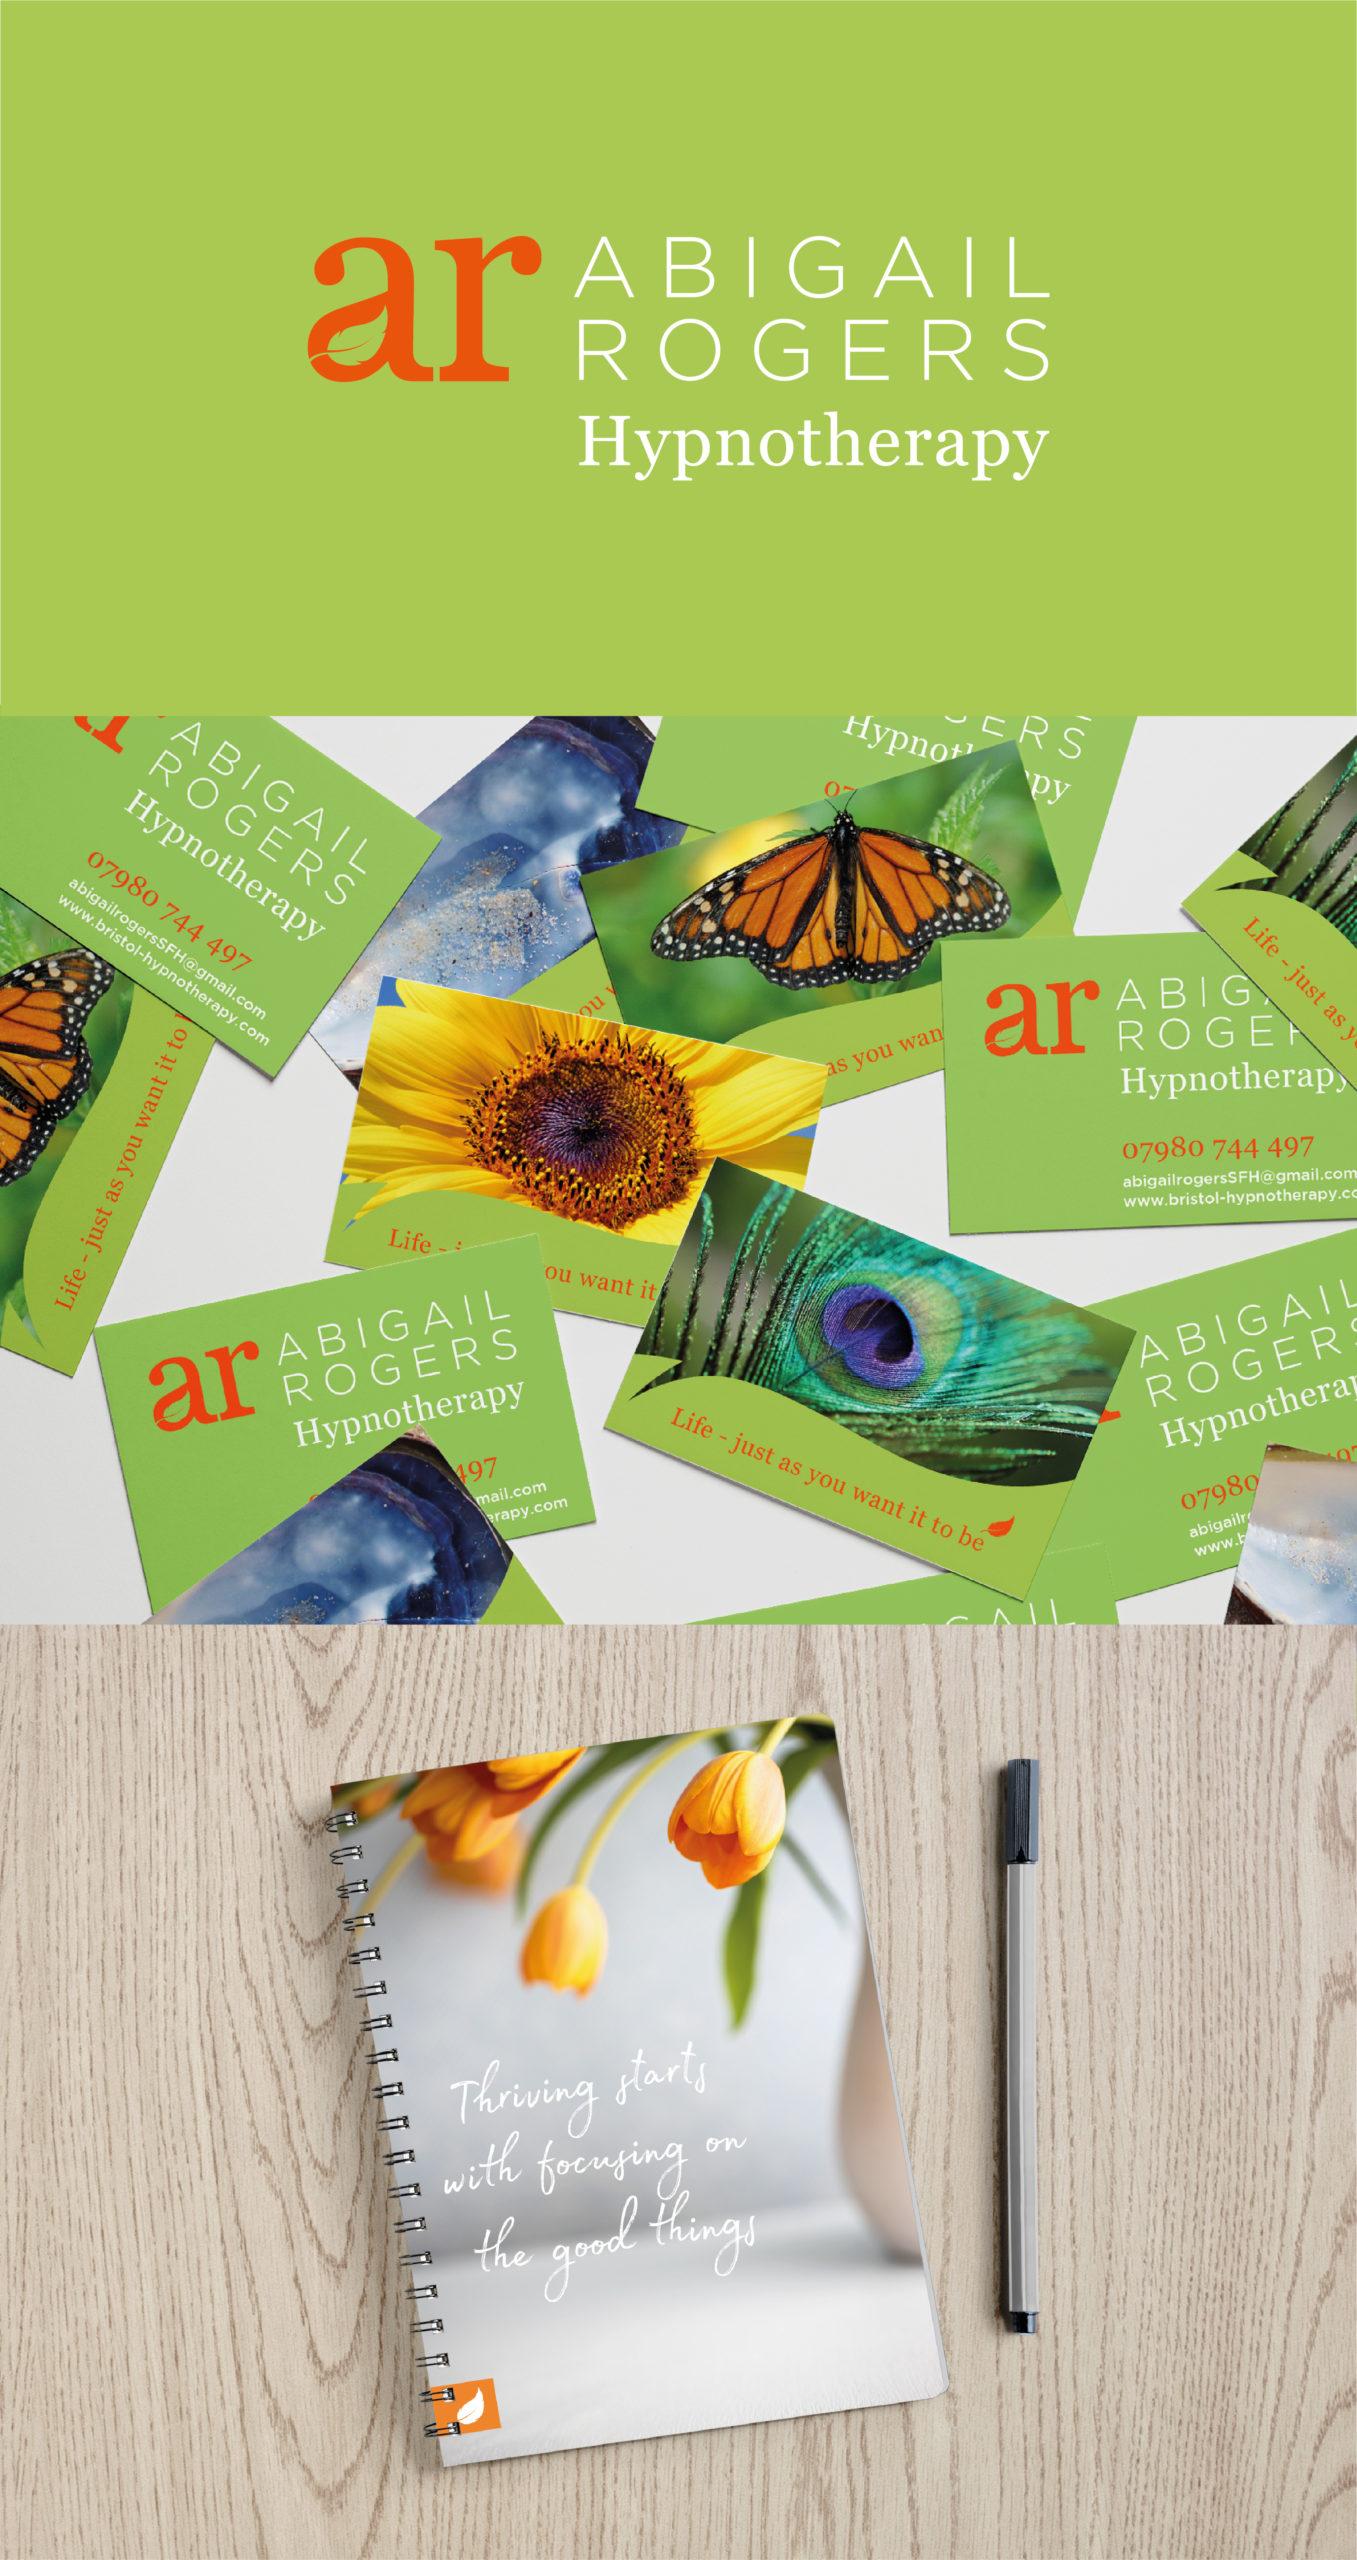 Abigail Rogers, branding for a Hypnotherapist. Portfolio image